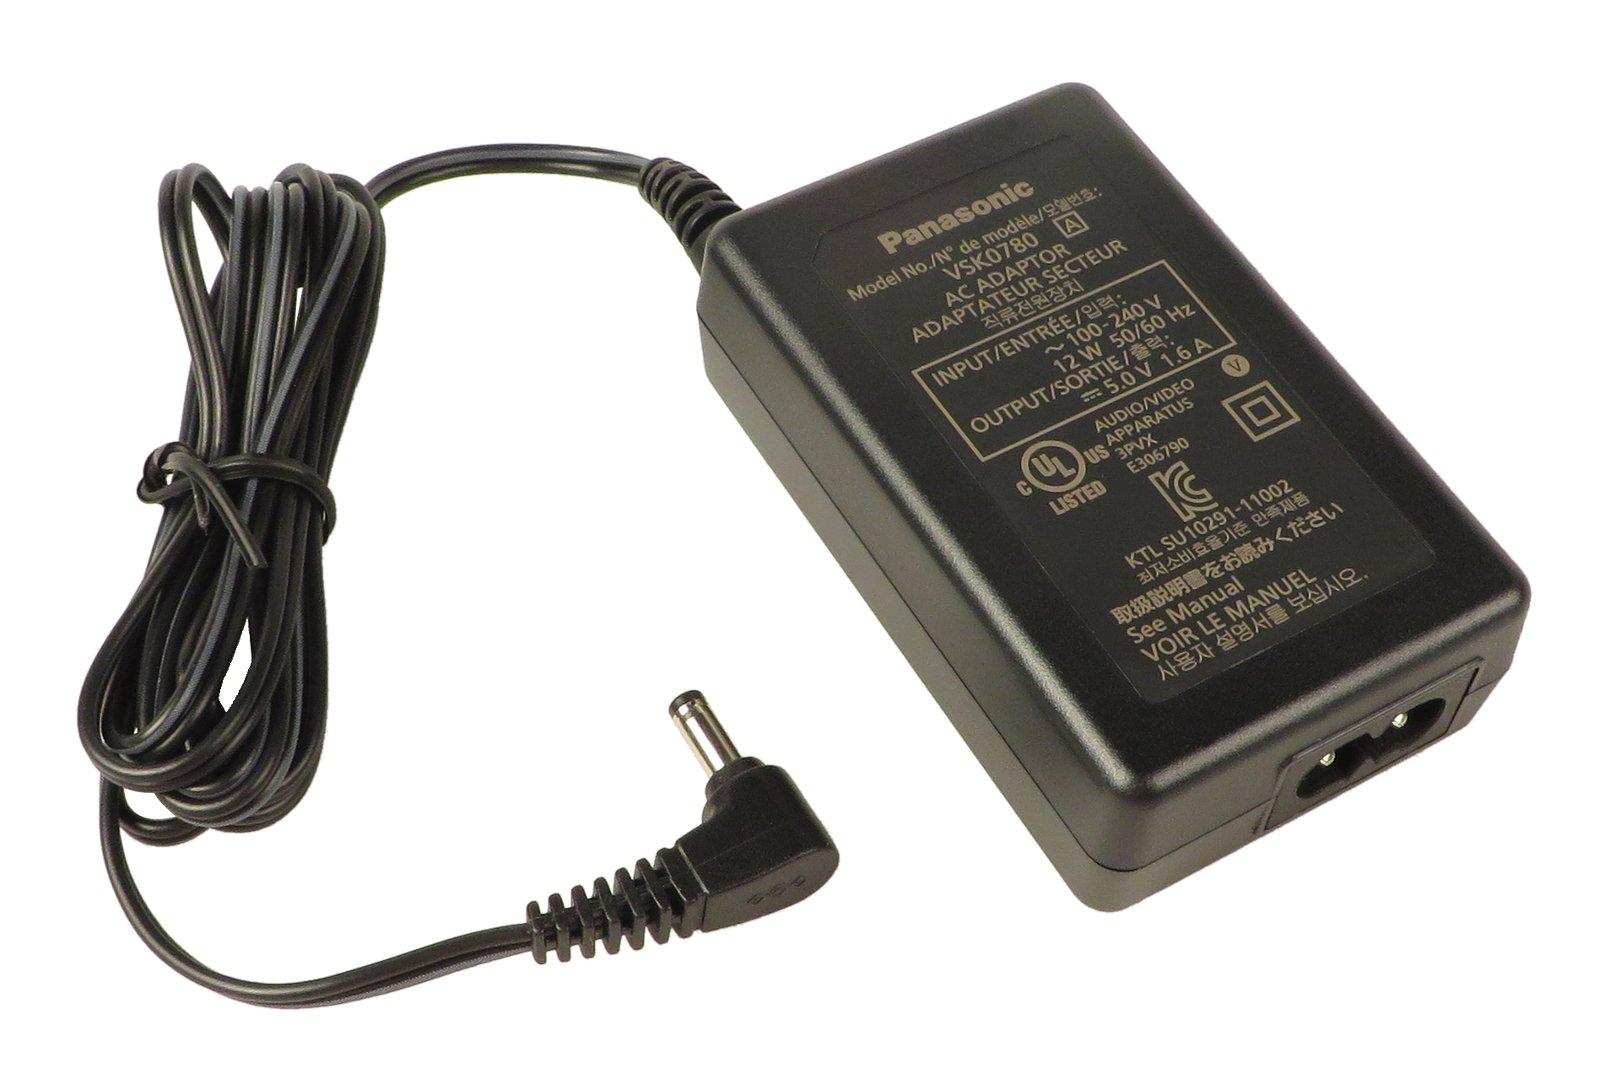 OMNIHIL 2-Port USB Car Charger w//Cord Compatible with Panasonic HC-V720 HC-V720GK HC-V720EB-K HC-V720K HC-V720EB